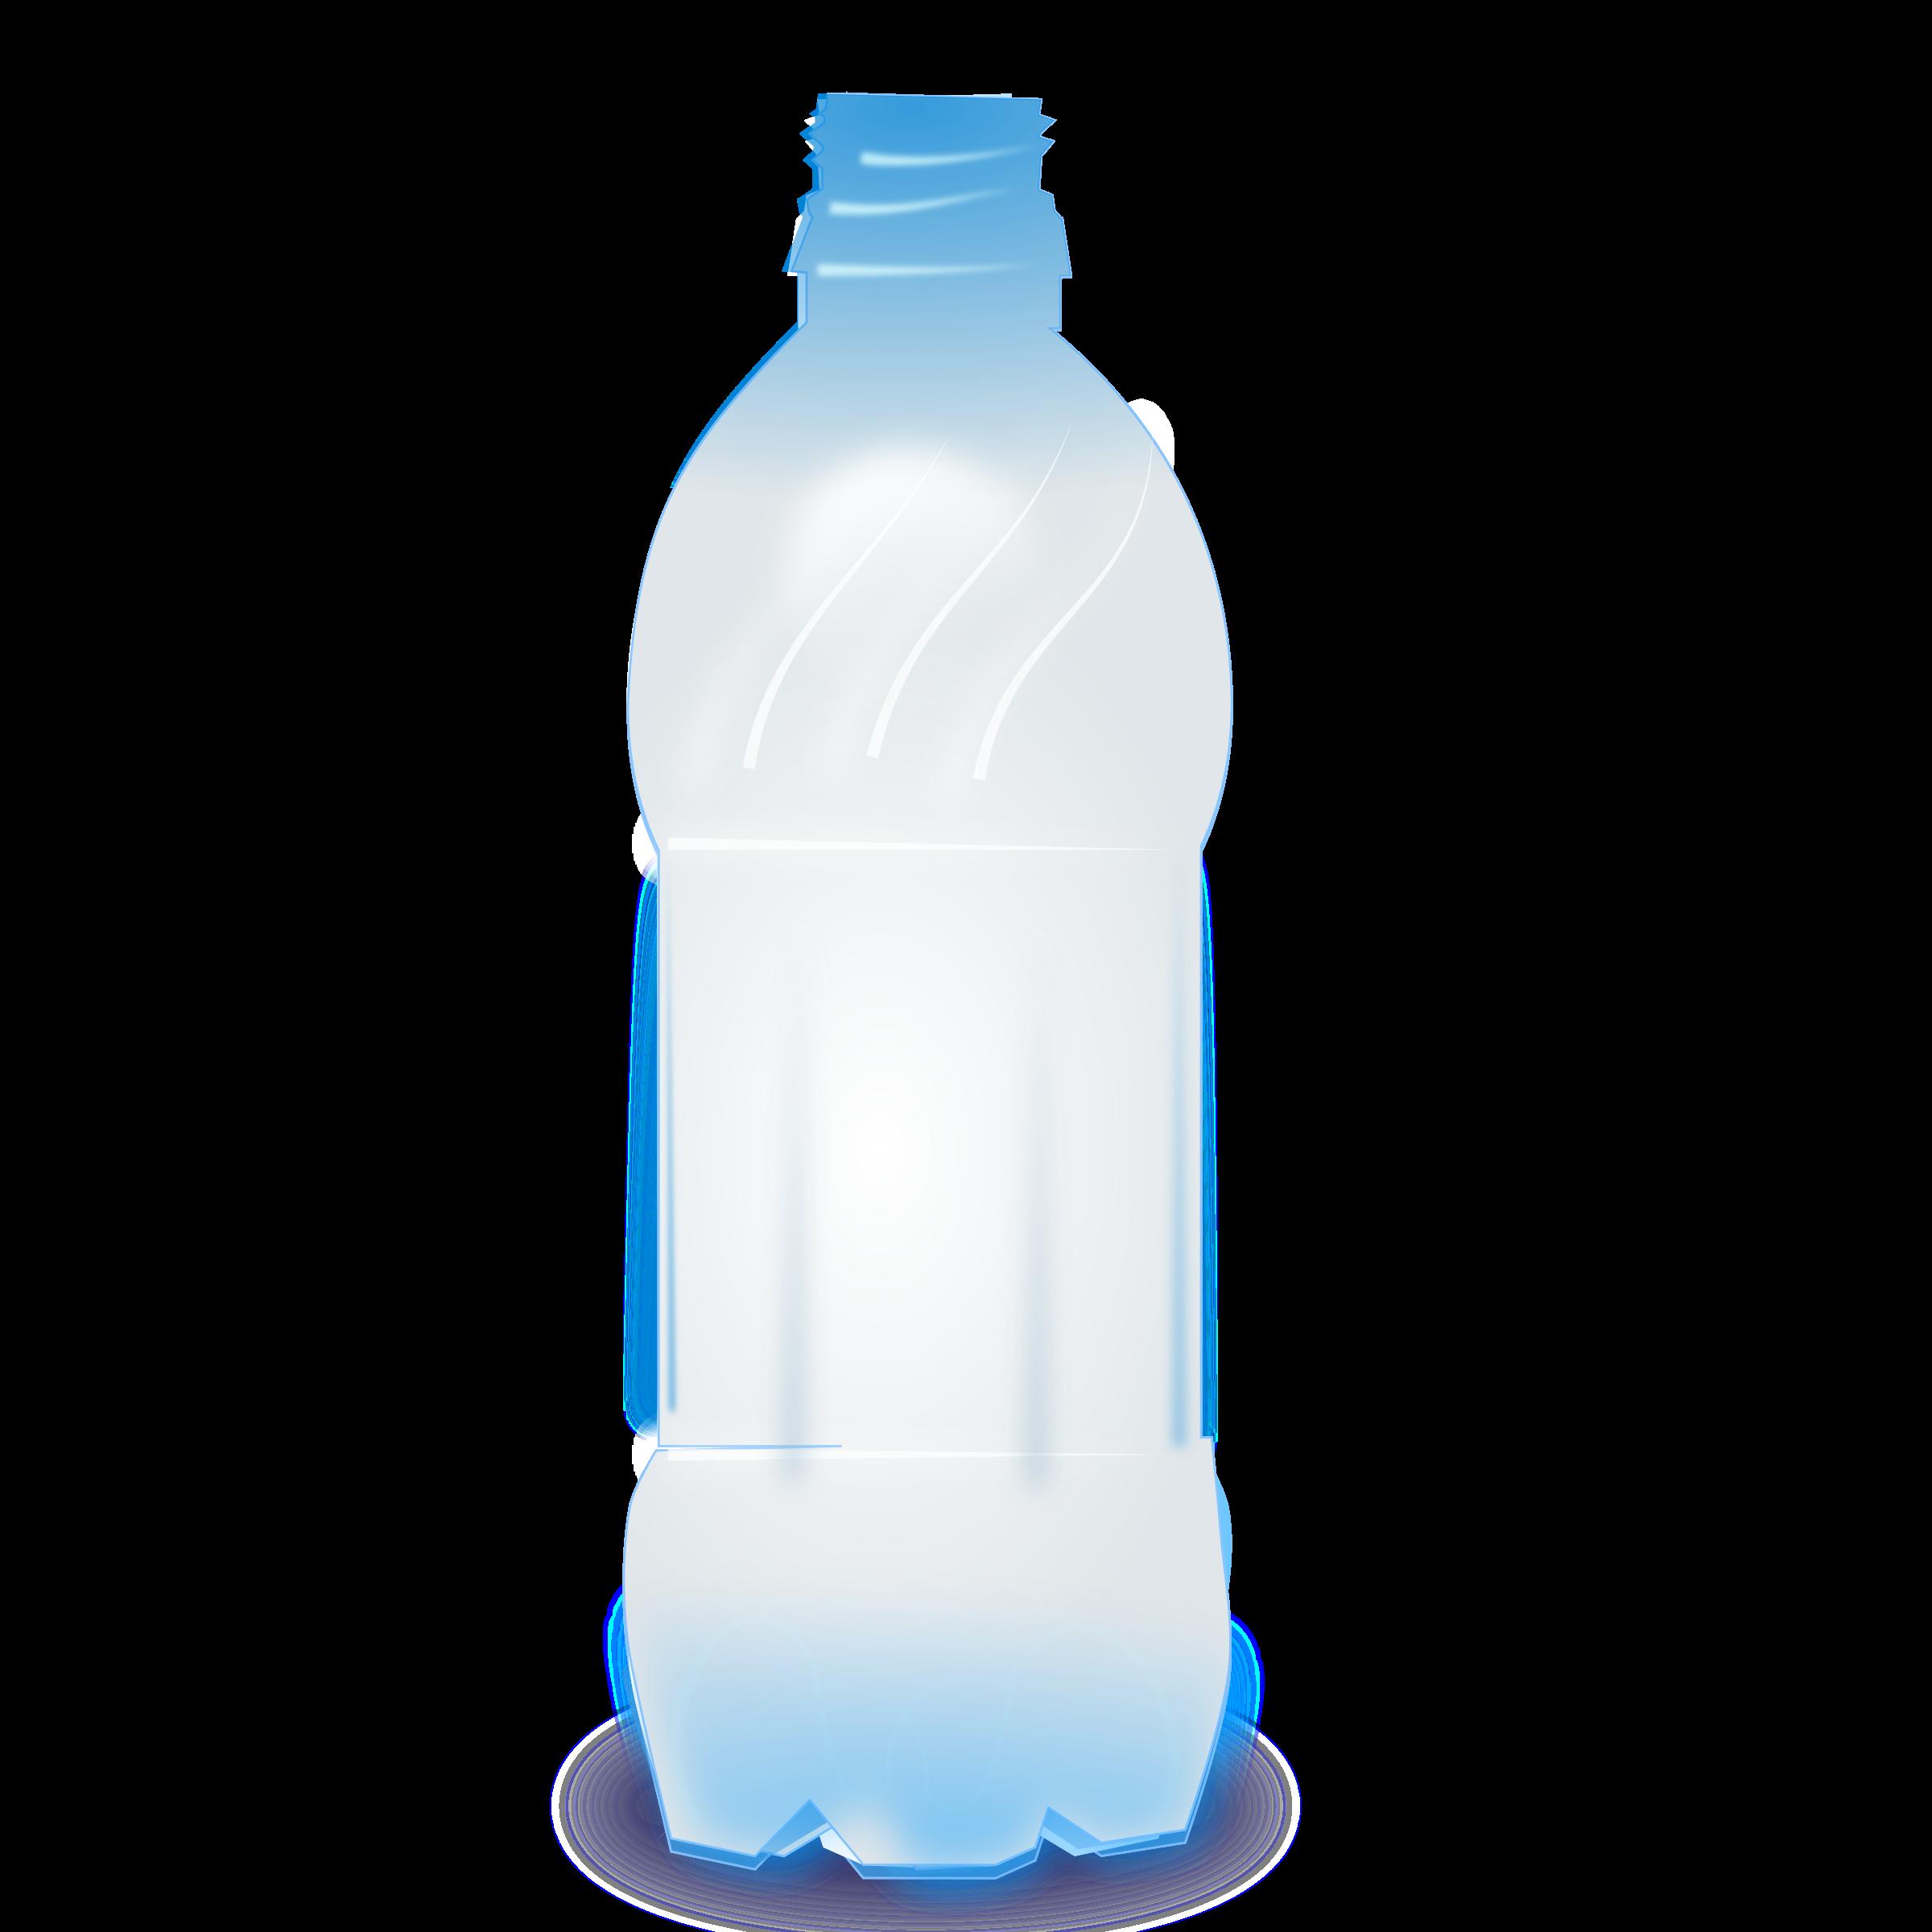 Clipart milk liquid object. Pet bottle big image